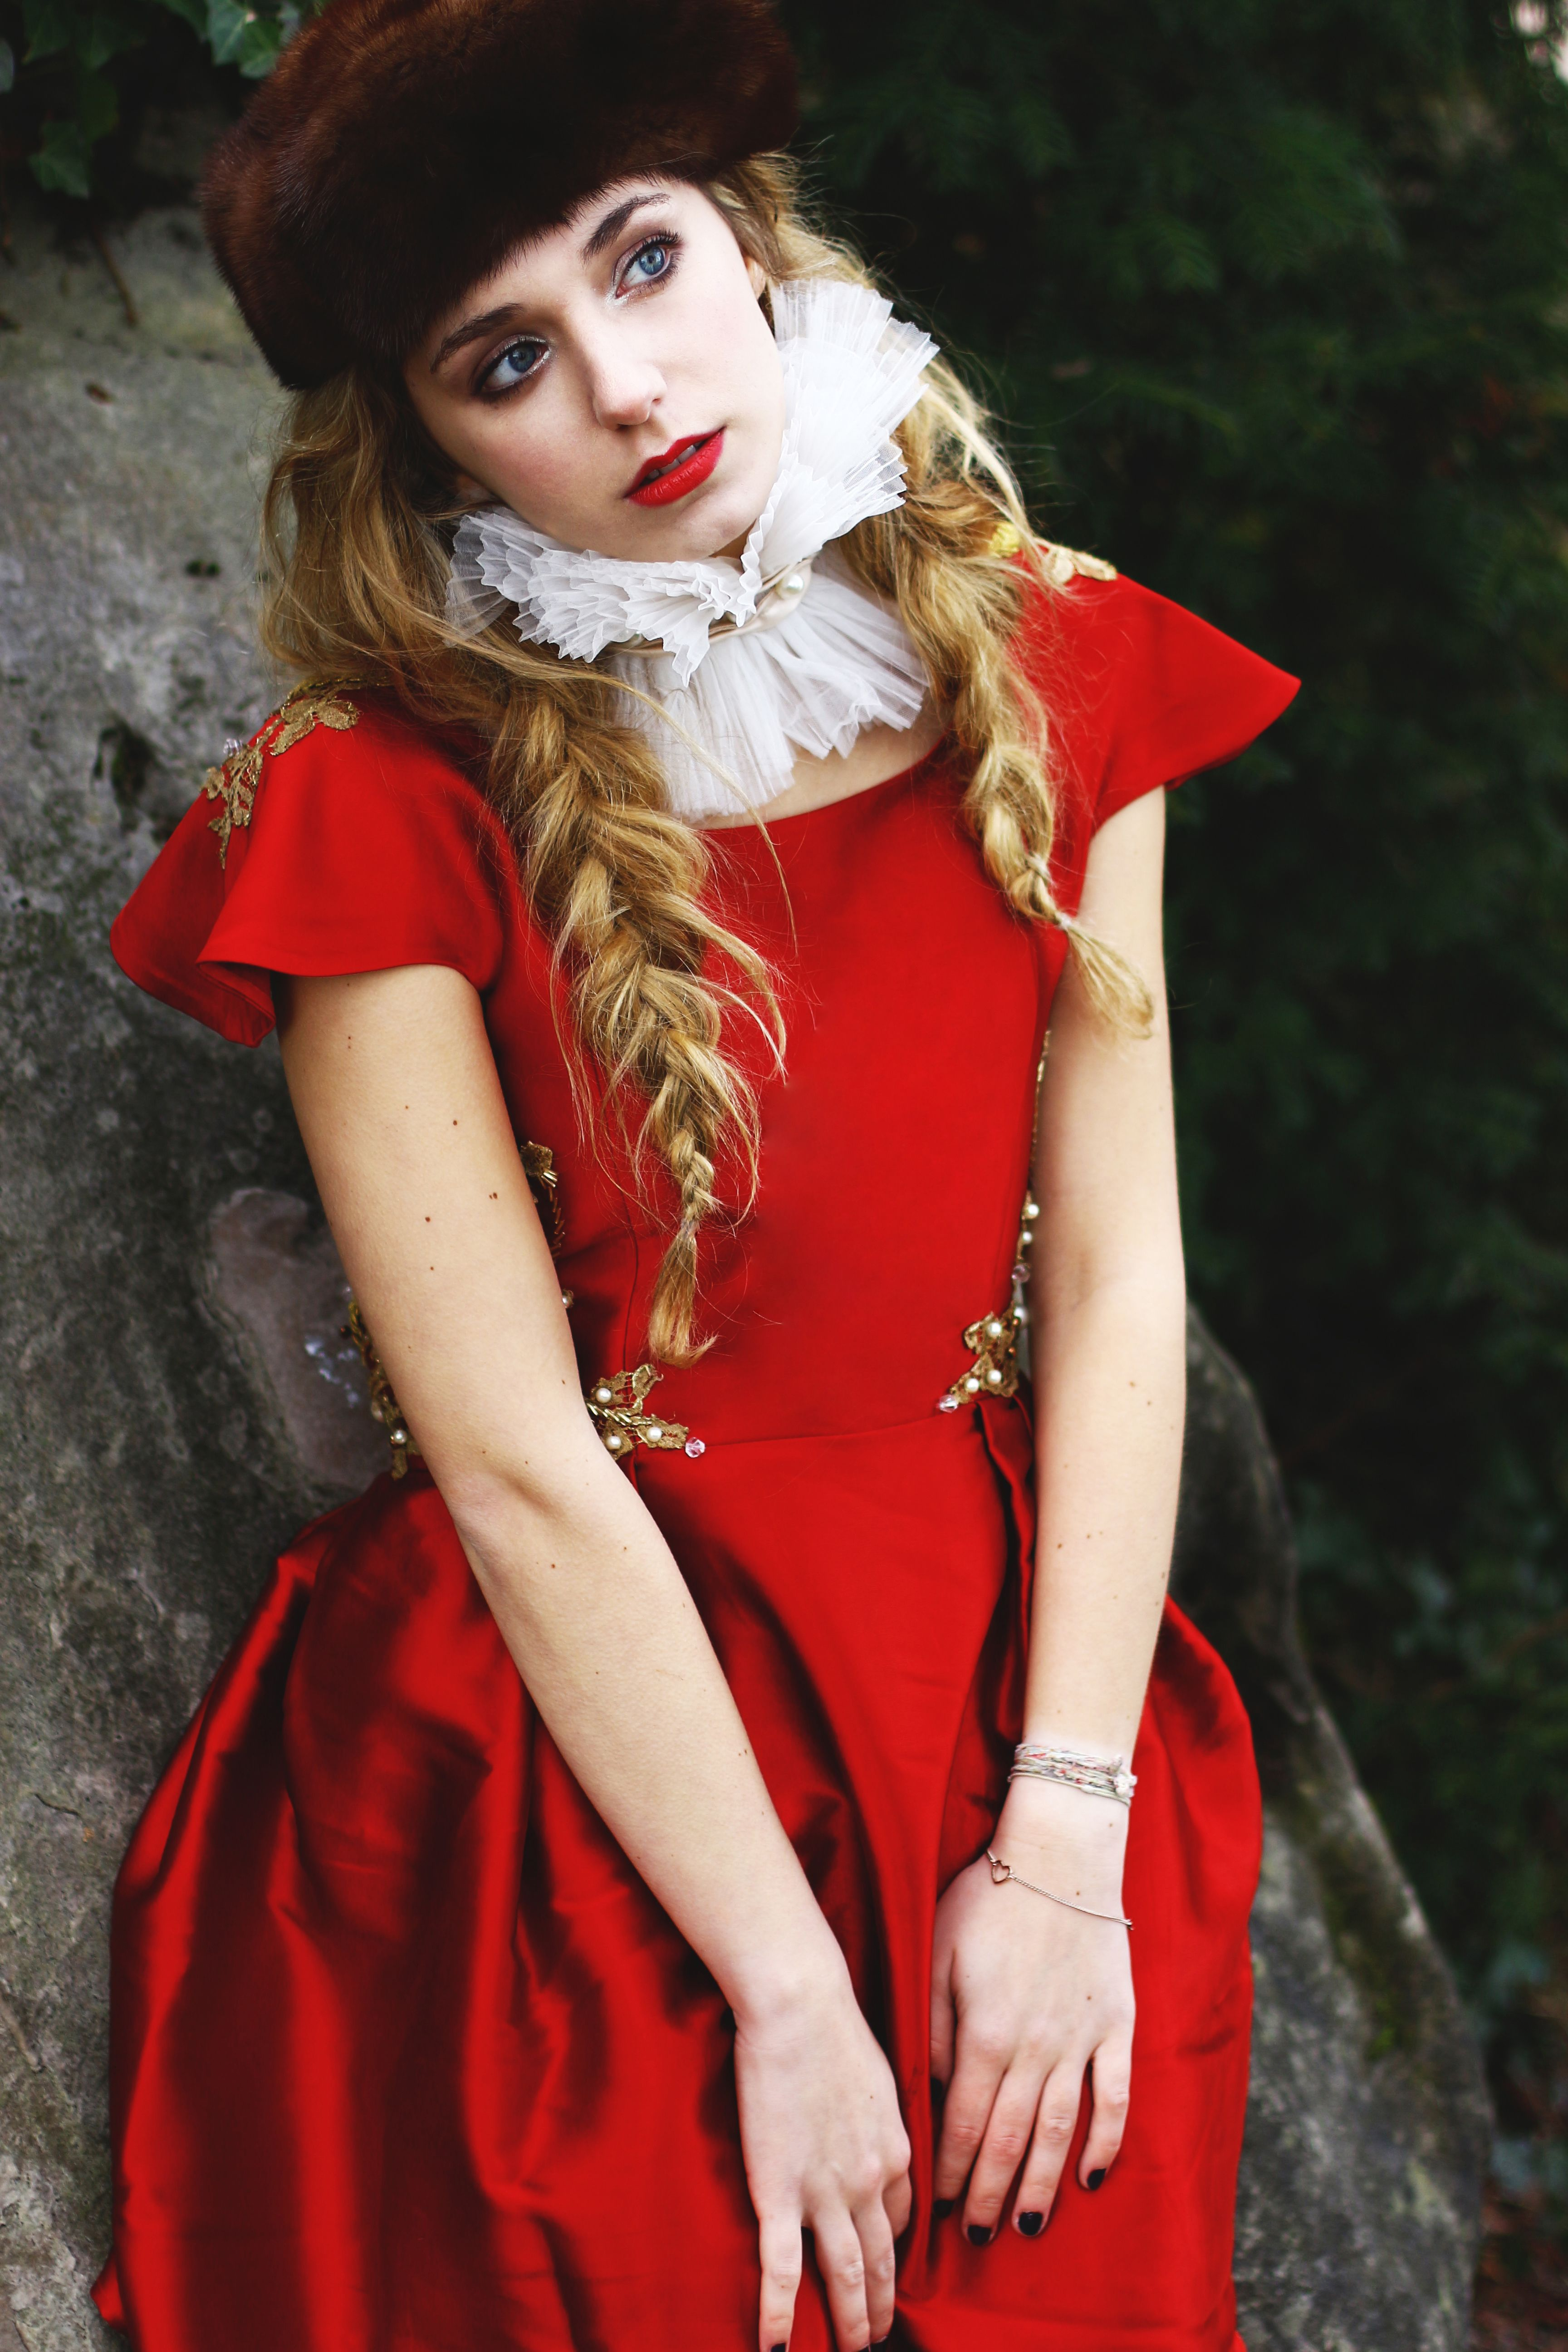 Princess of folklore by Katia BDR for Seekme magazine / Styling Amany Gogo / MUAH Mona Purple